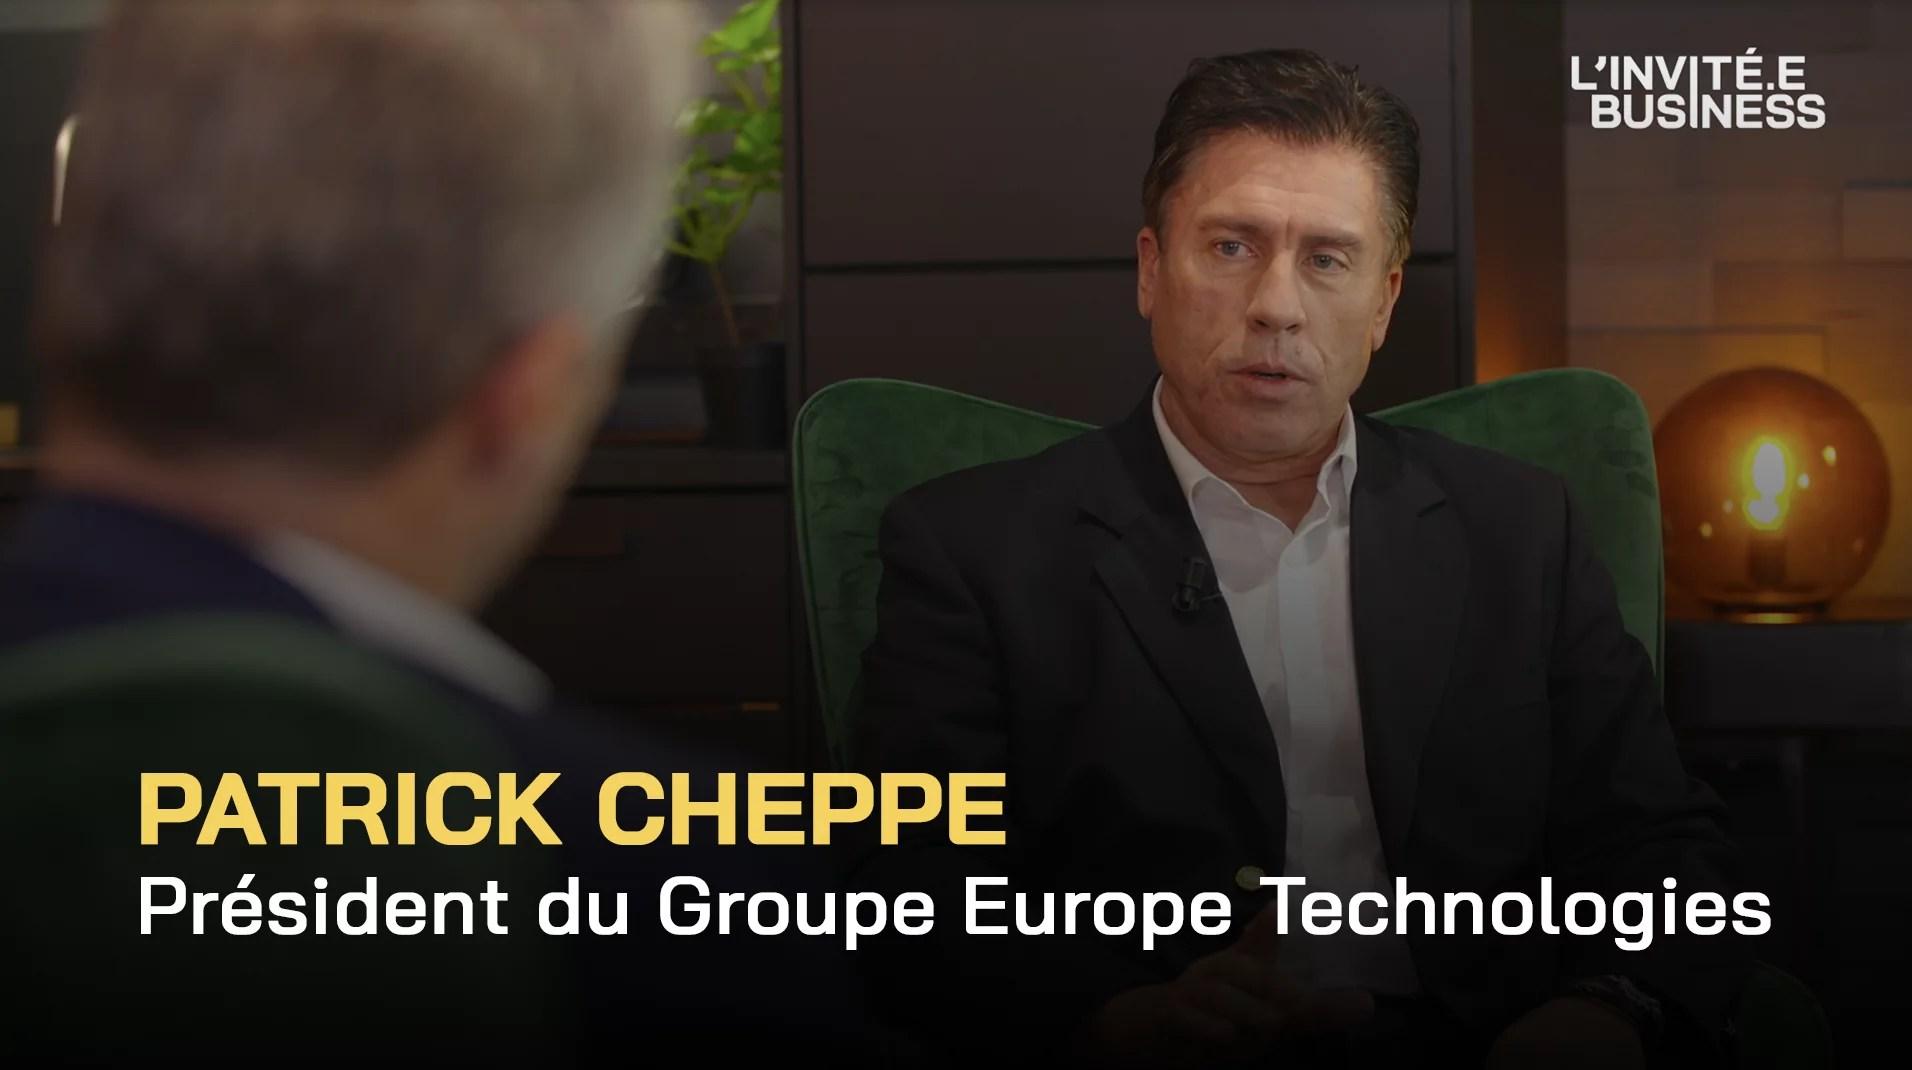 Patrick Cheppe